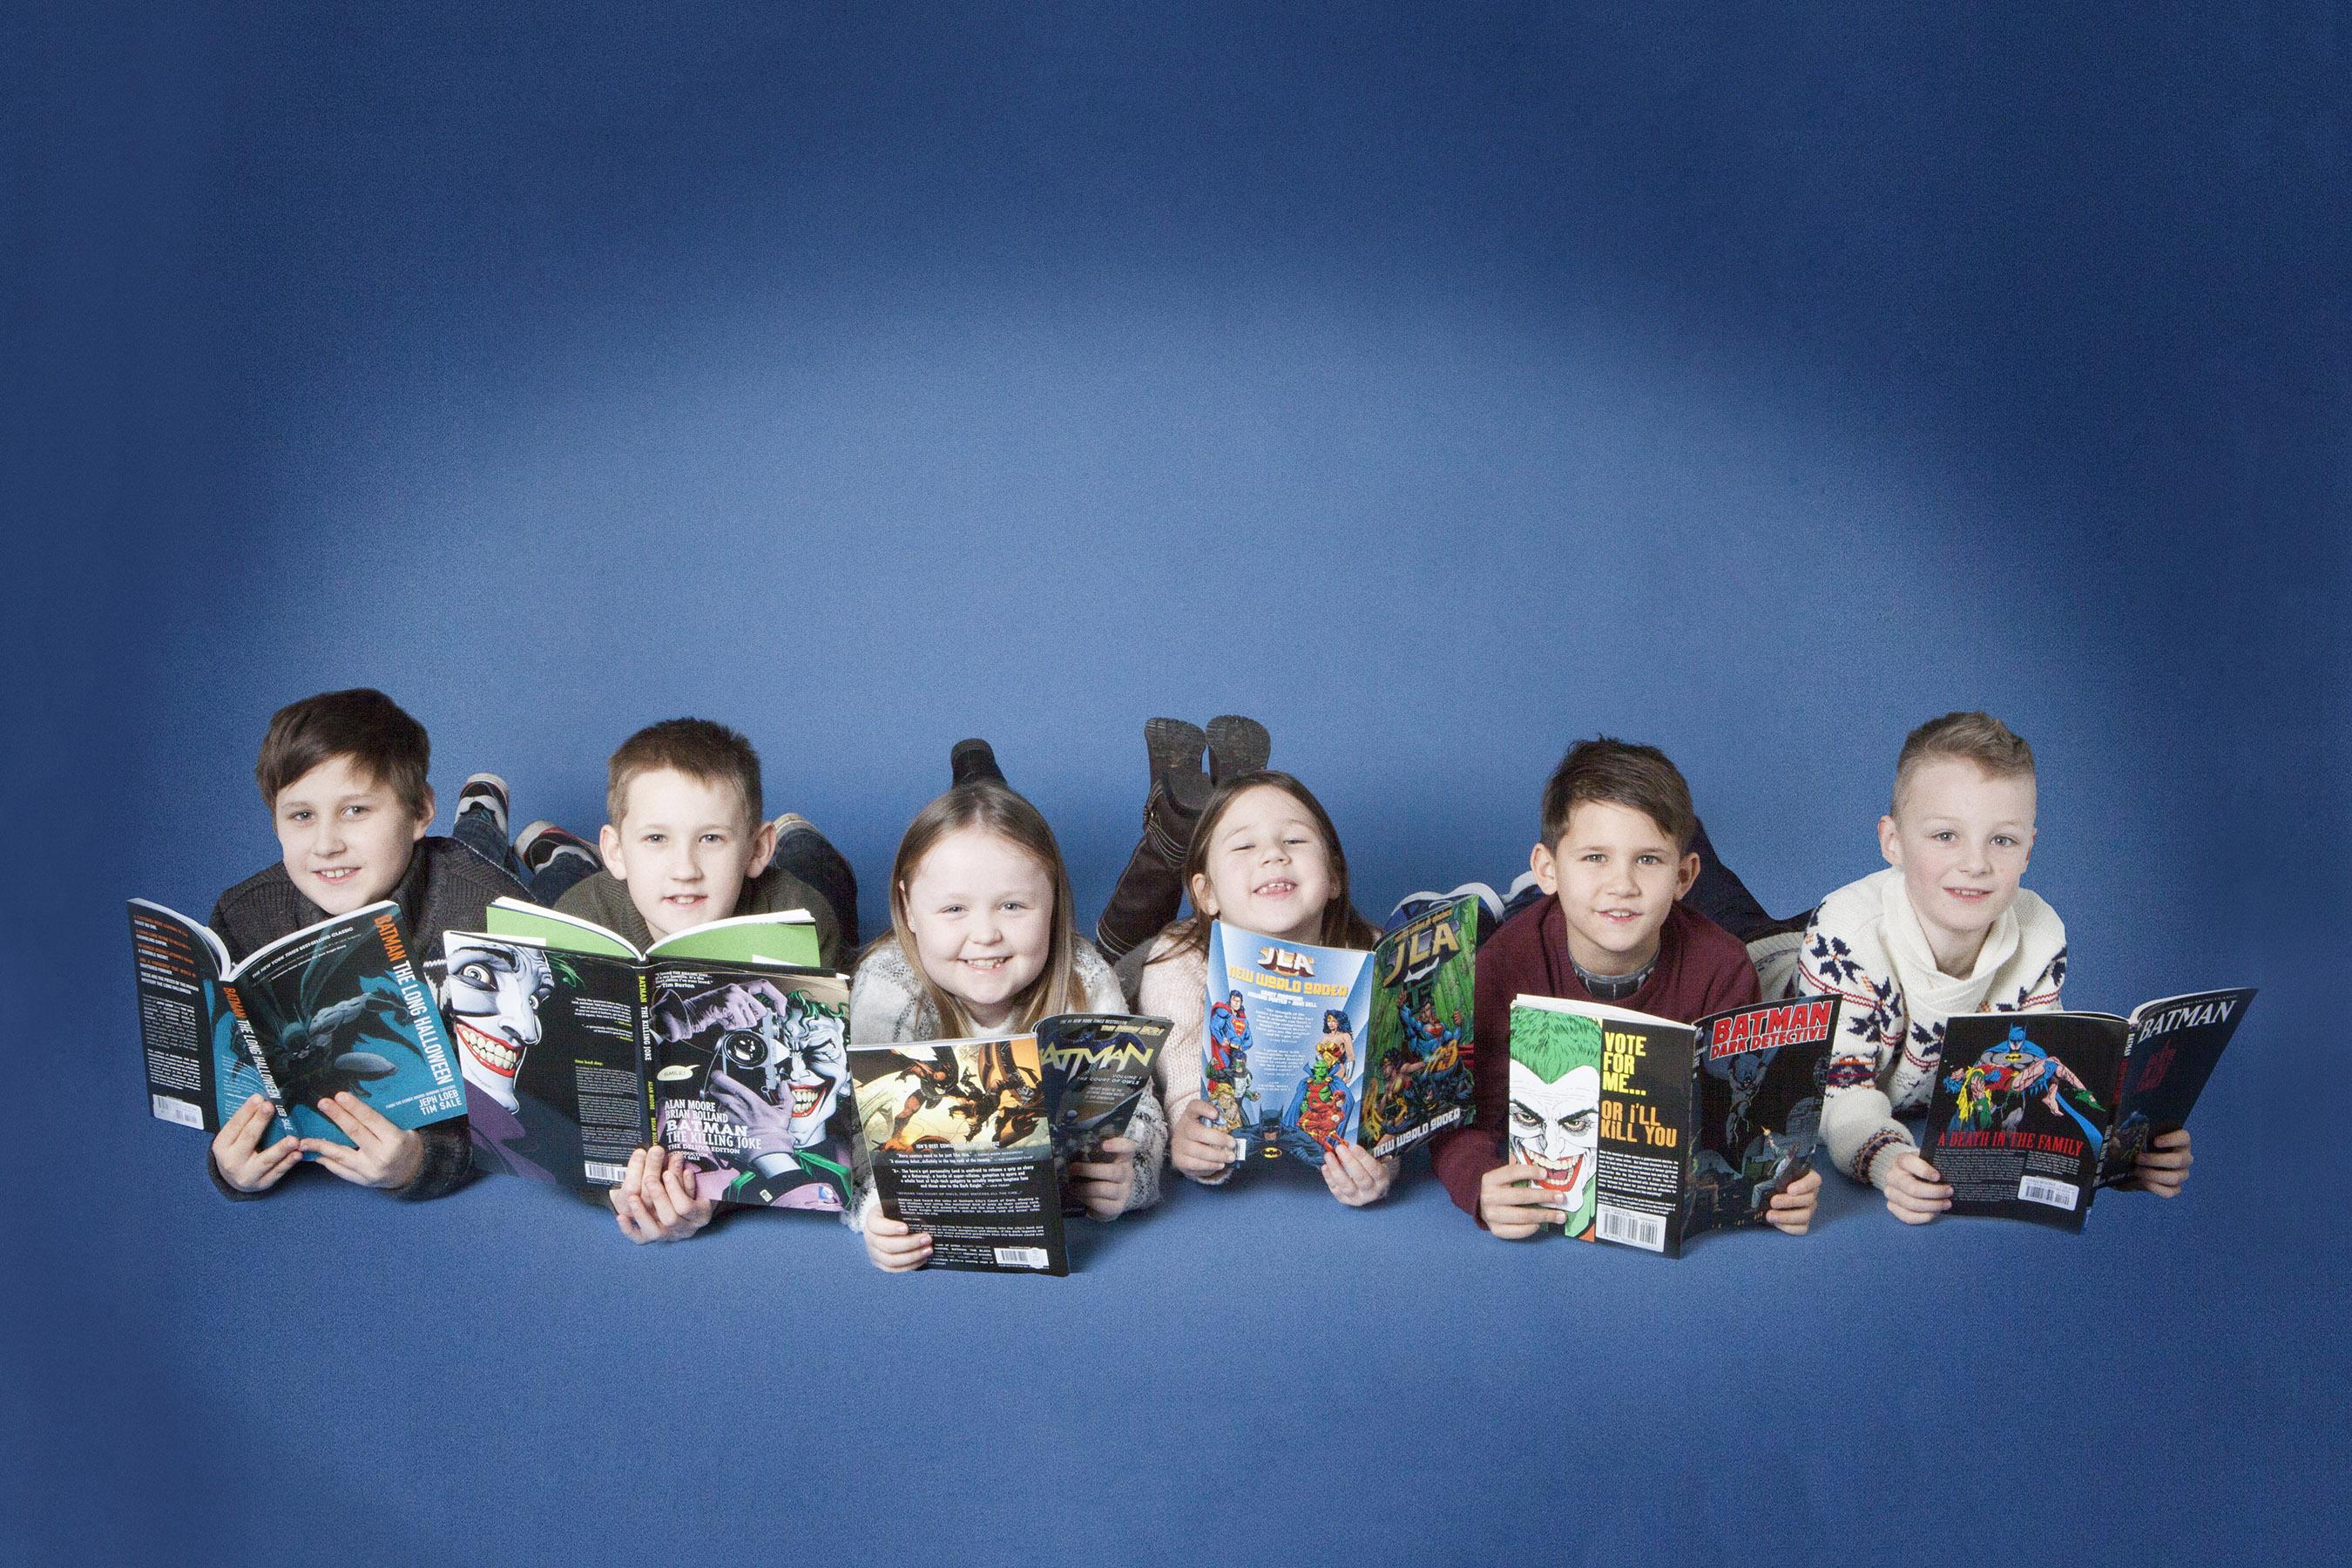 Family portrait photography Dorchester Dorset book reading